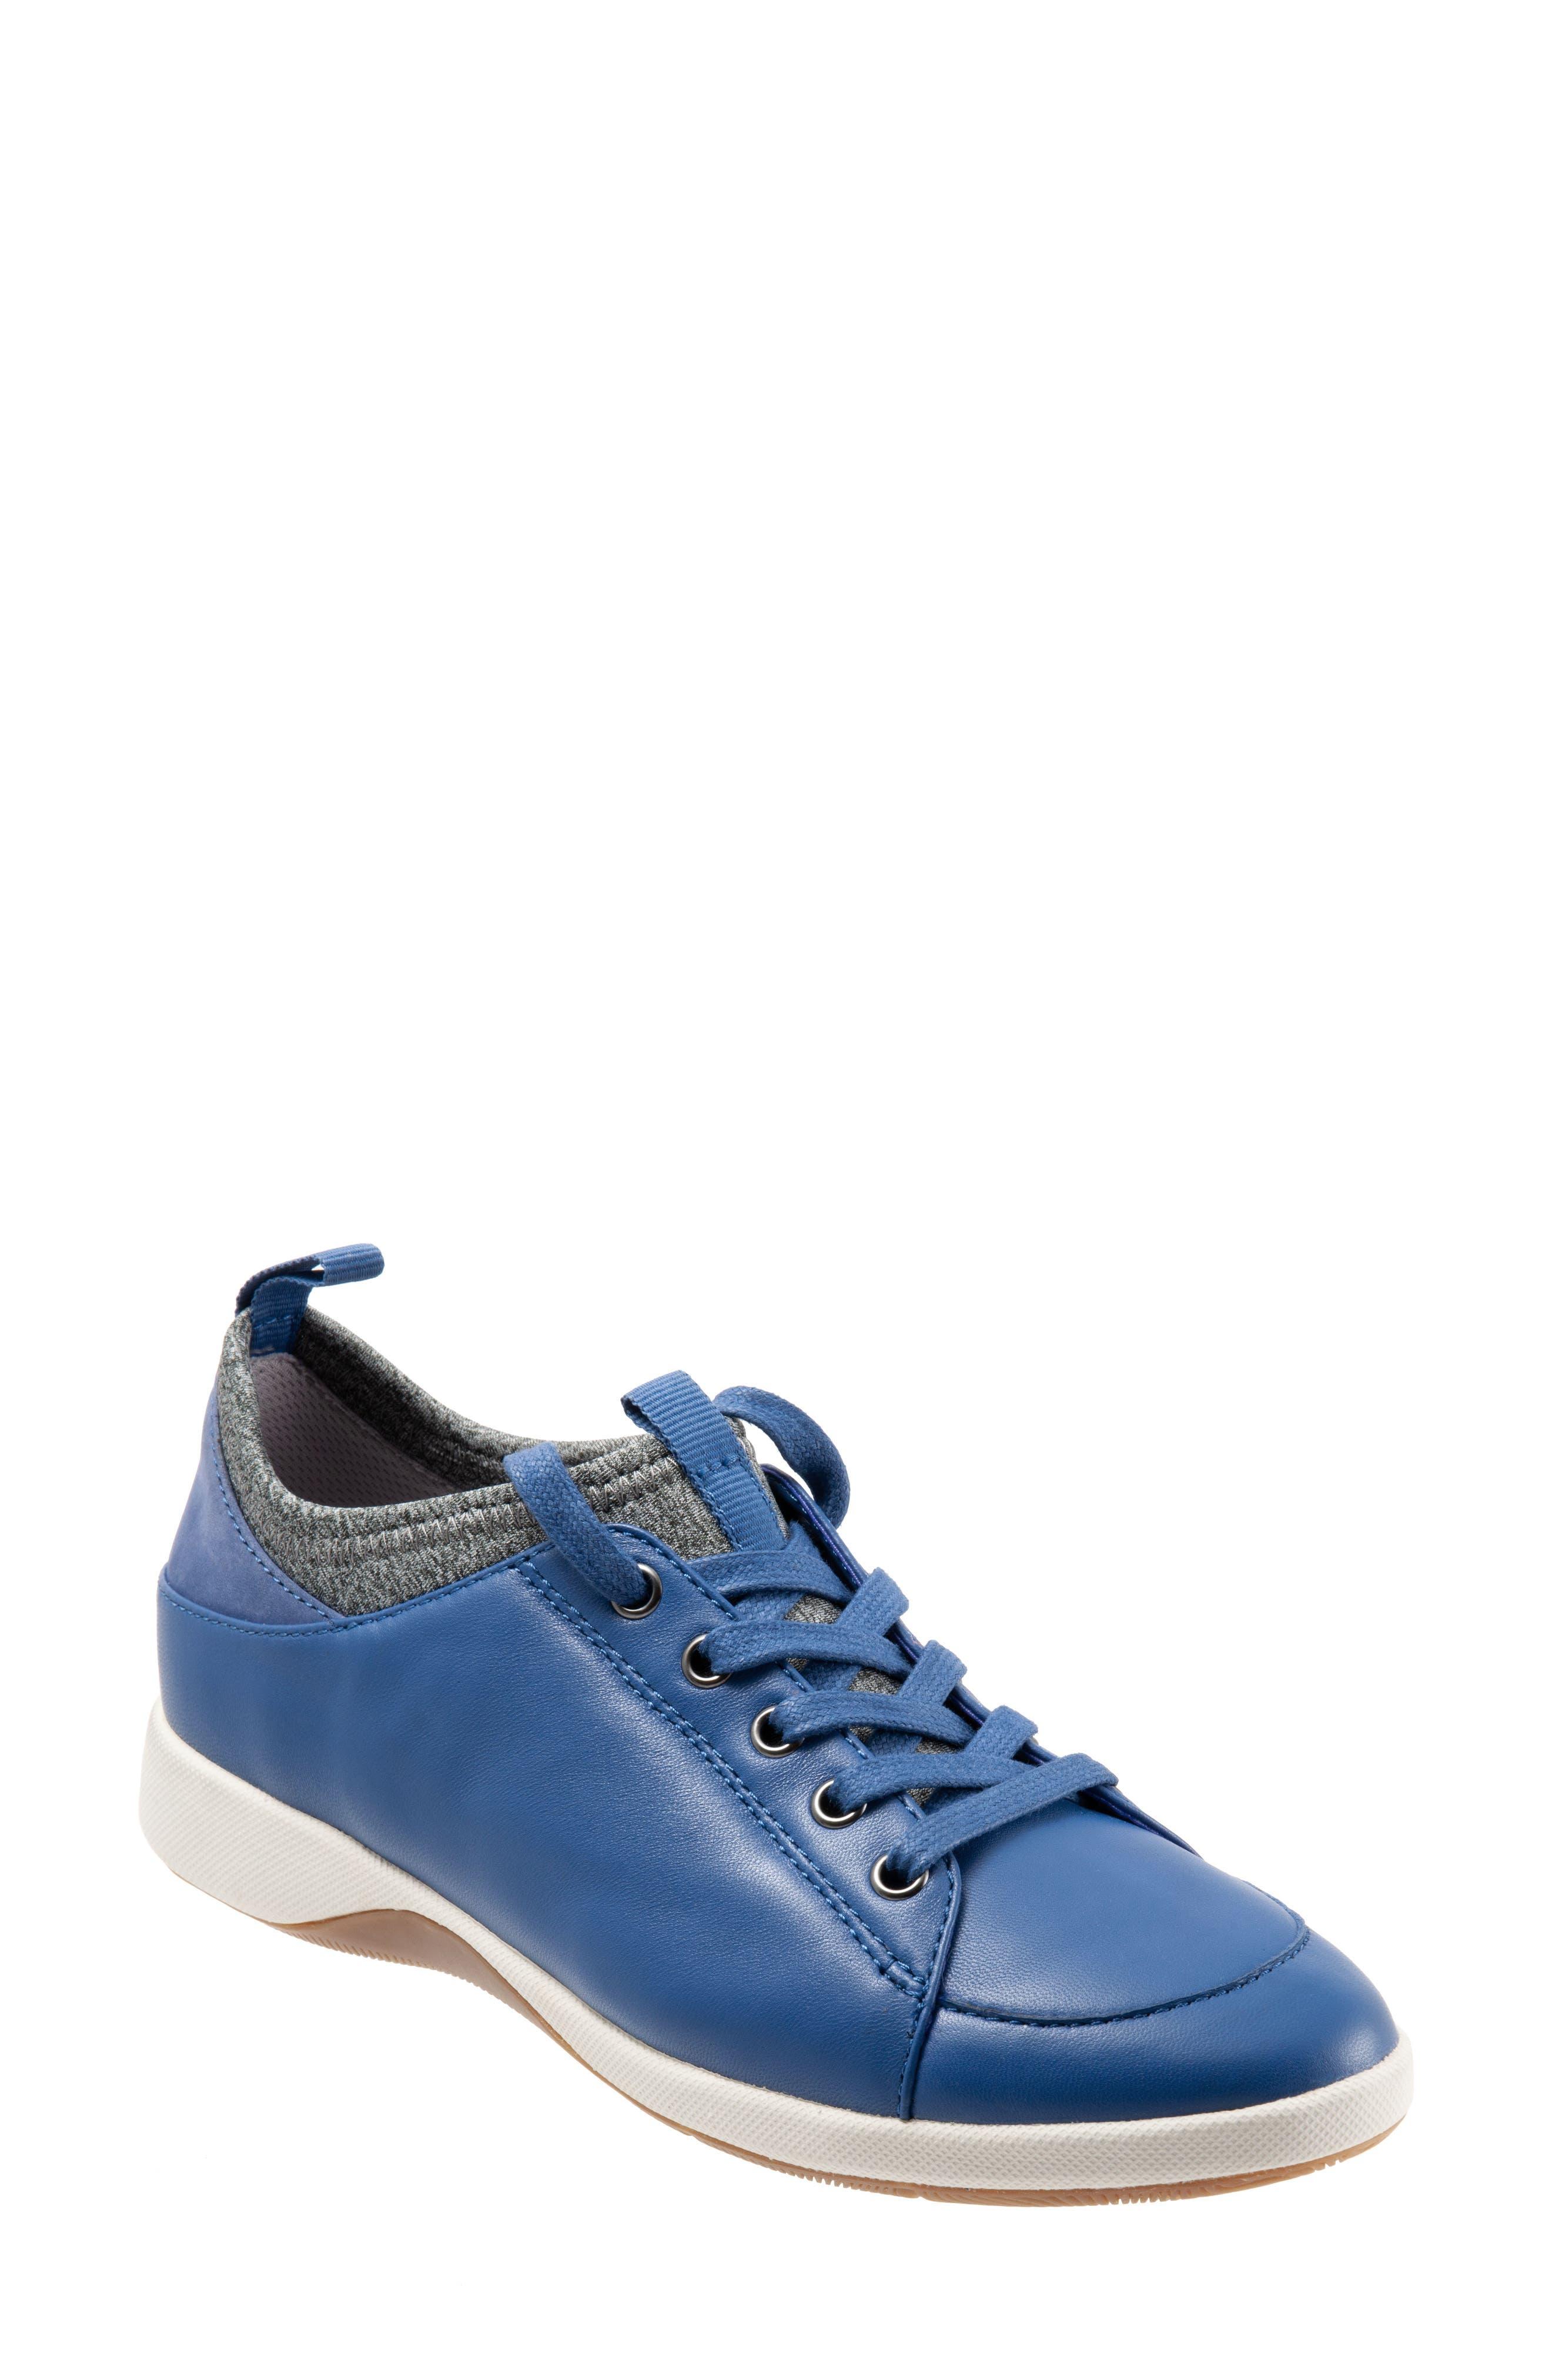 Softwalk Sava Haven Sneaker, W - Blue